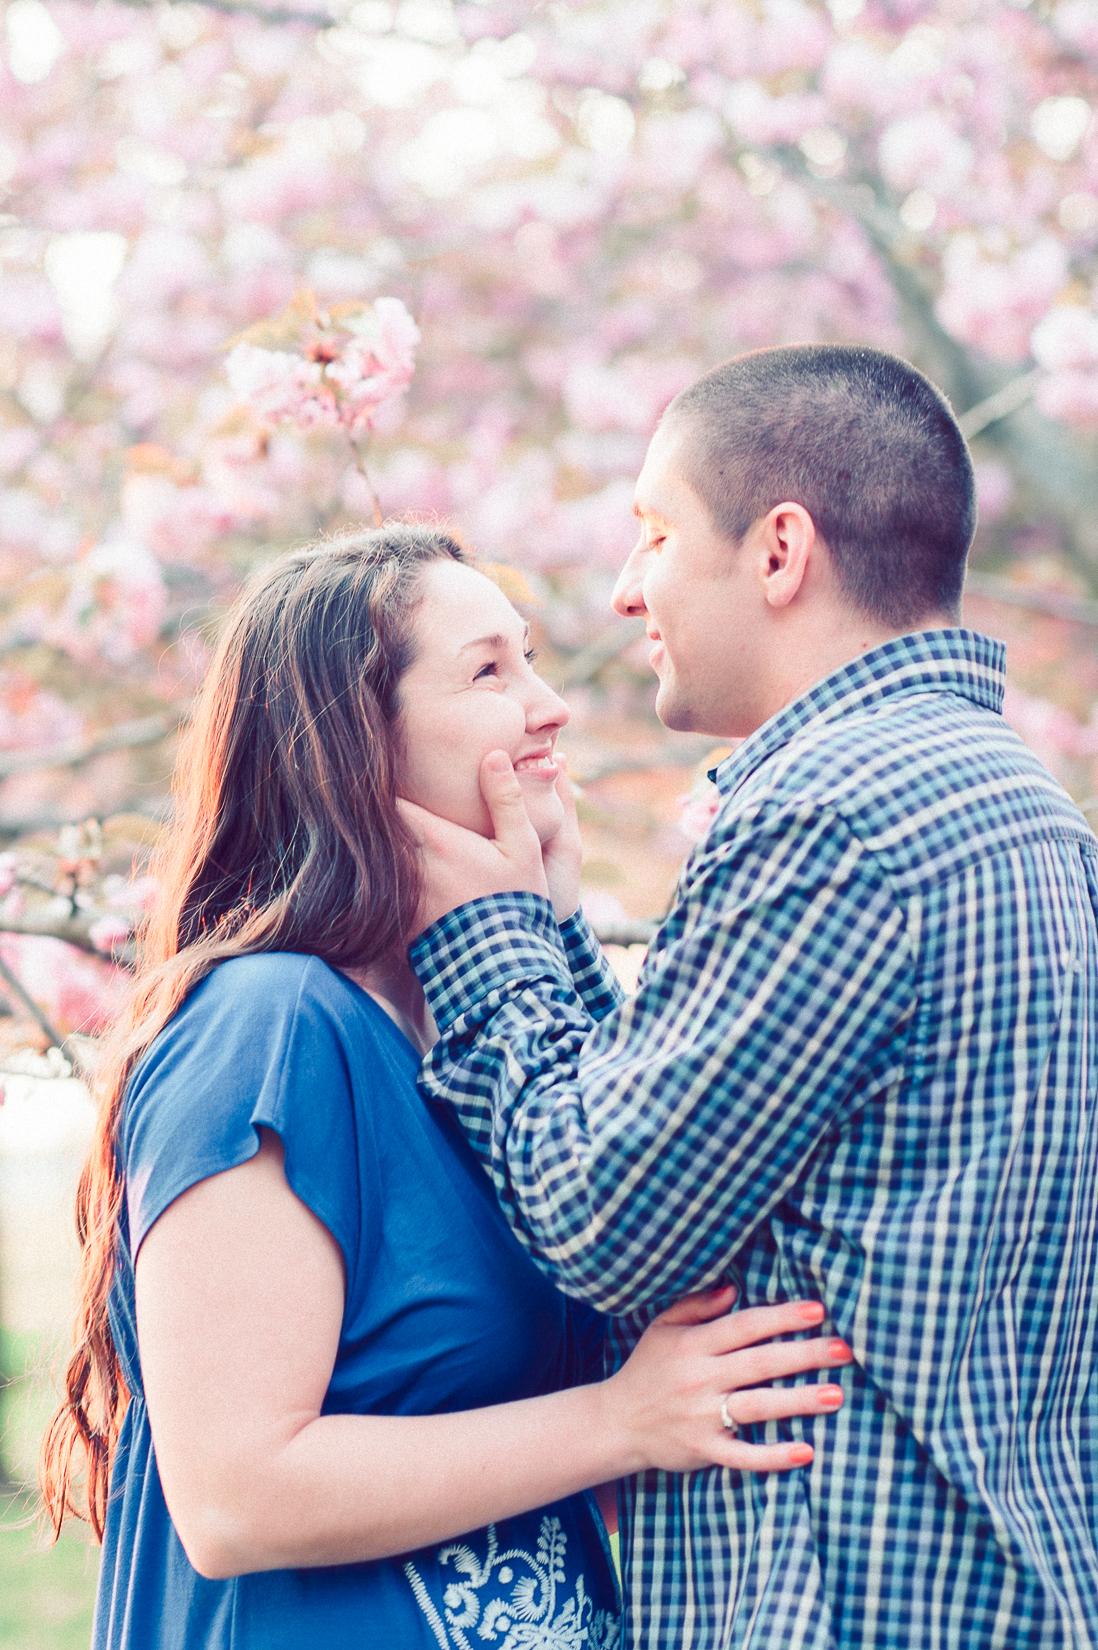 engagement_cherryblossoms_virginiaweddingphotographer_JanieHunter (16).jpg